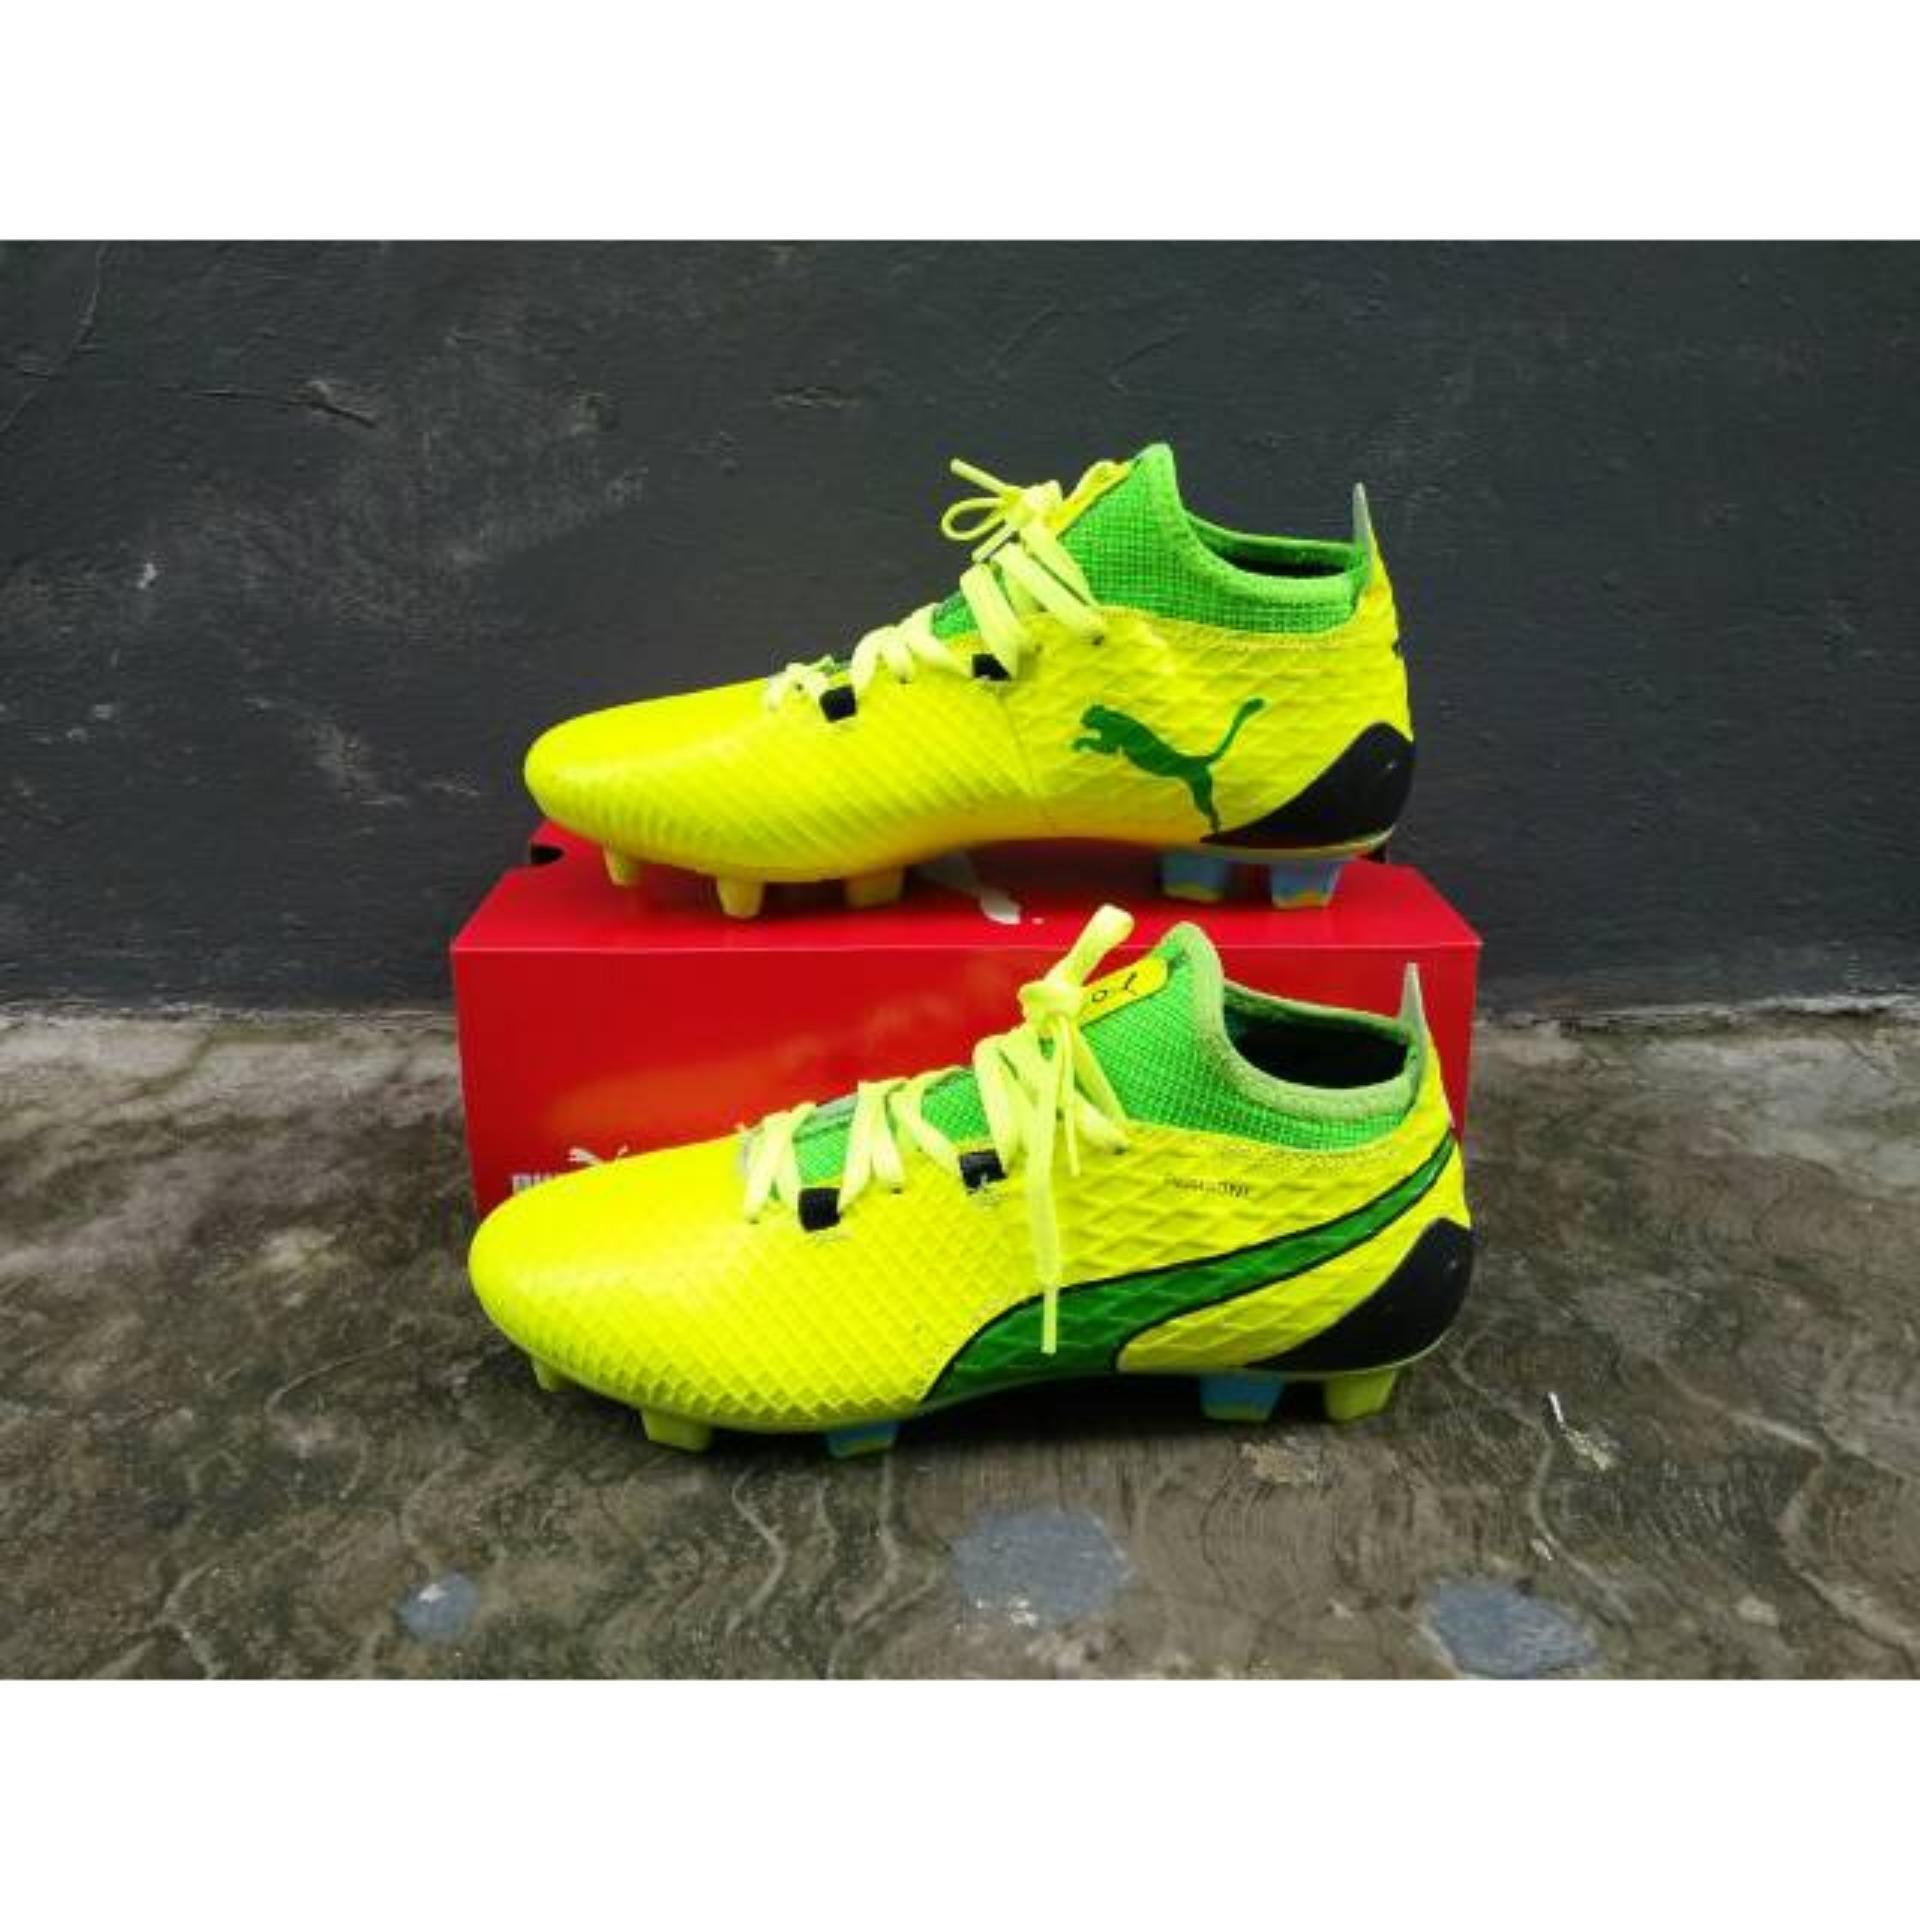 Beli Murah Harga Diskon Sepatu Bola Specs Bafana Fg Lemon Toko Kualitas Grad Ori Vietnam Hjau Stabilo